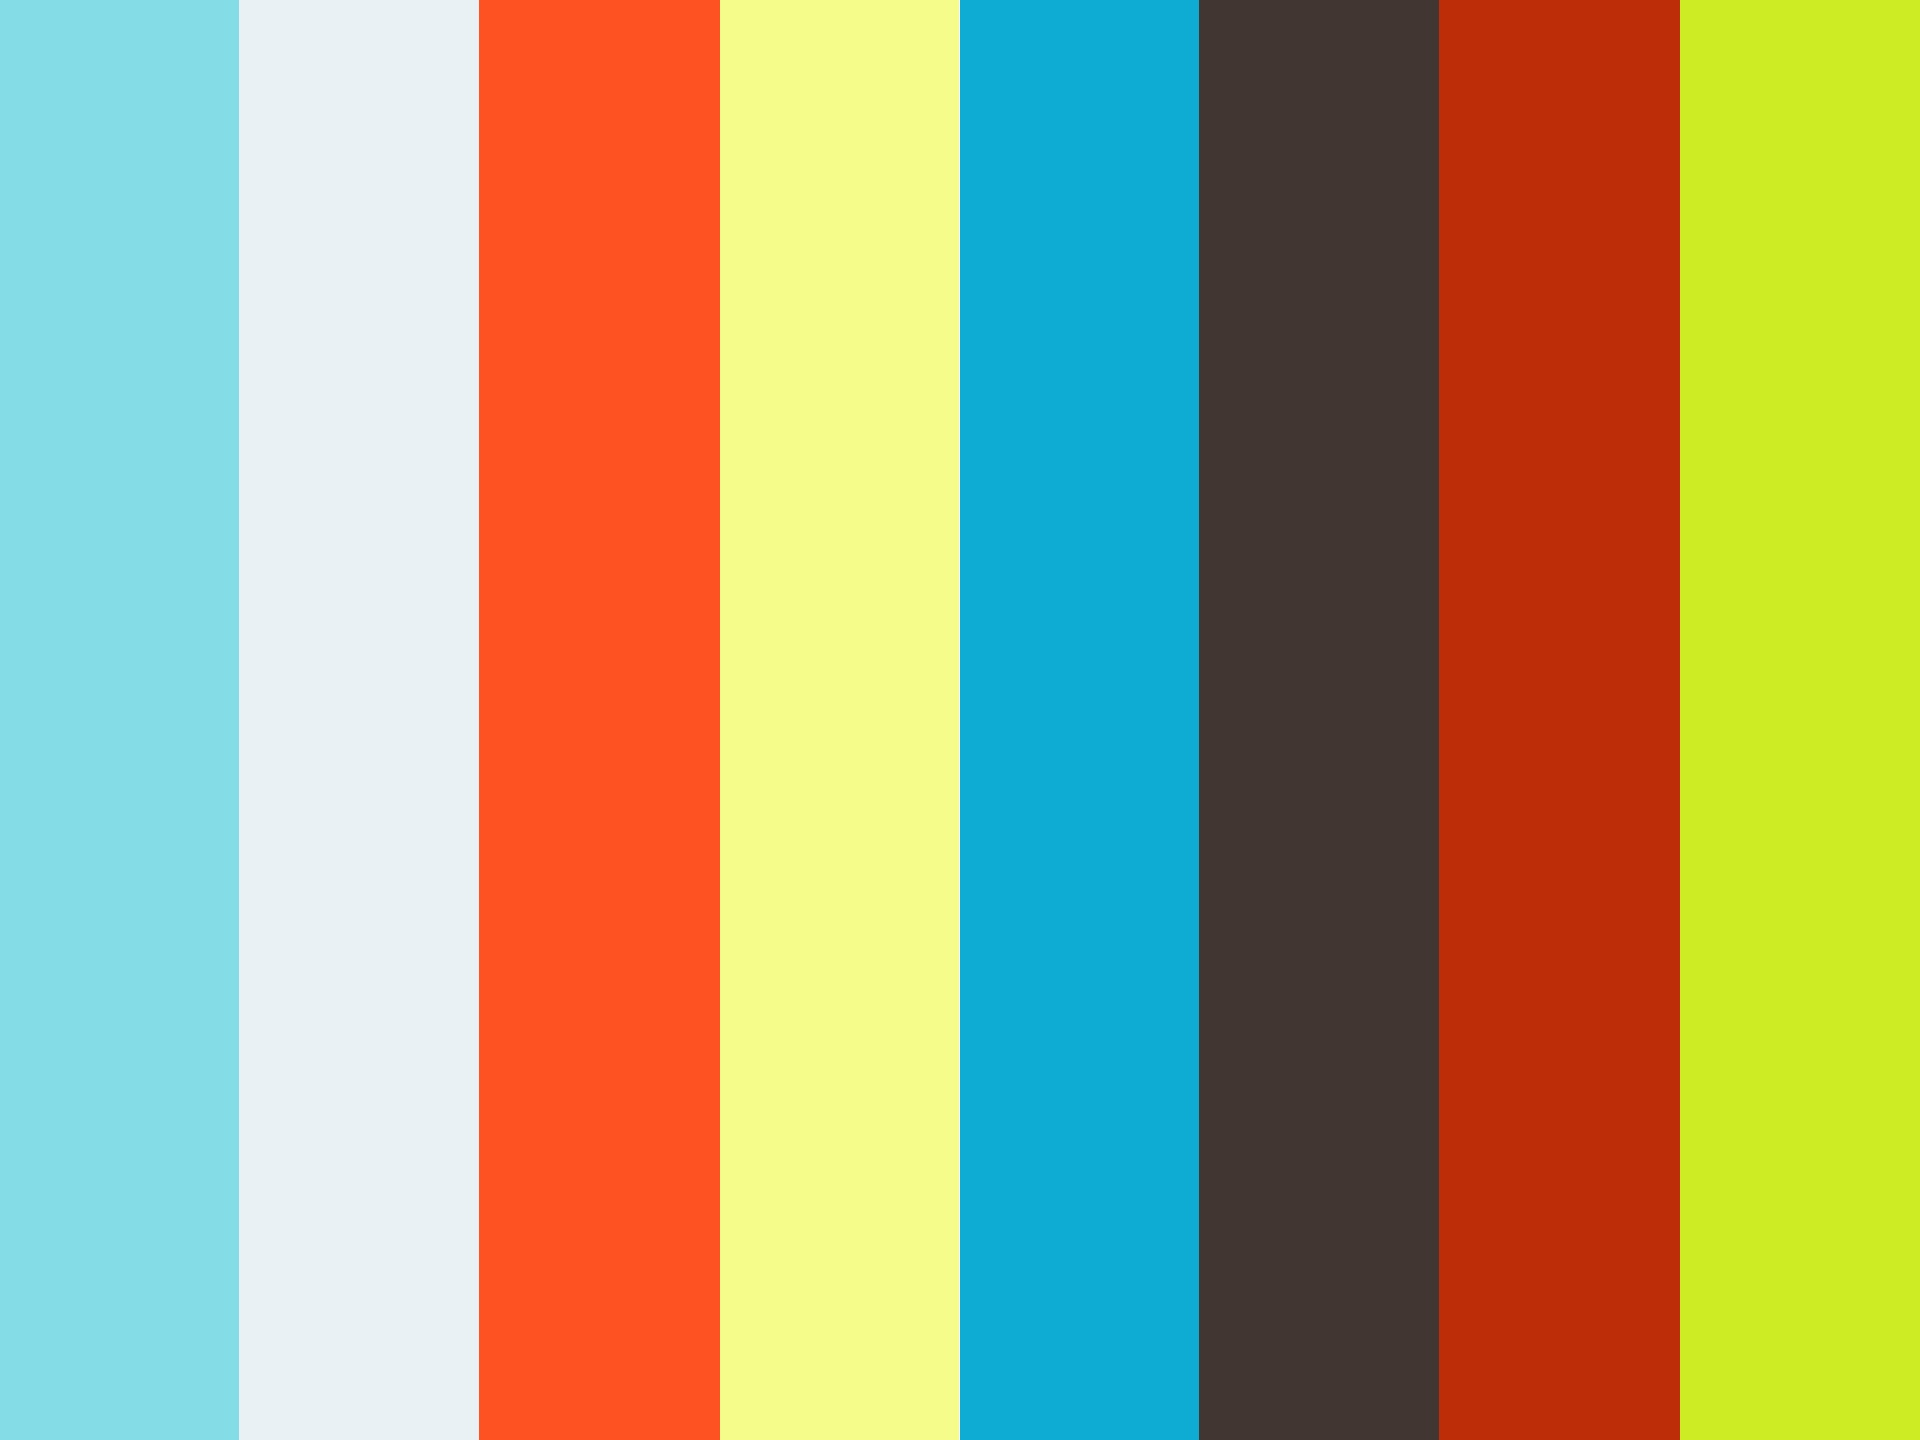 Overlay?src0=https%3a%2f%2fi.vimeocdn.com%2fvideo%2f681973448 1280x720.jpg&src1=https%3a%2f%2ff.vimeocdn.com%2fimages v6%2fshare%2fplay icon overlay